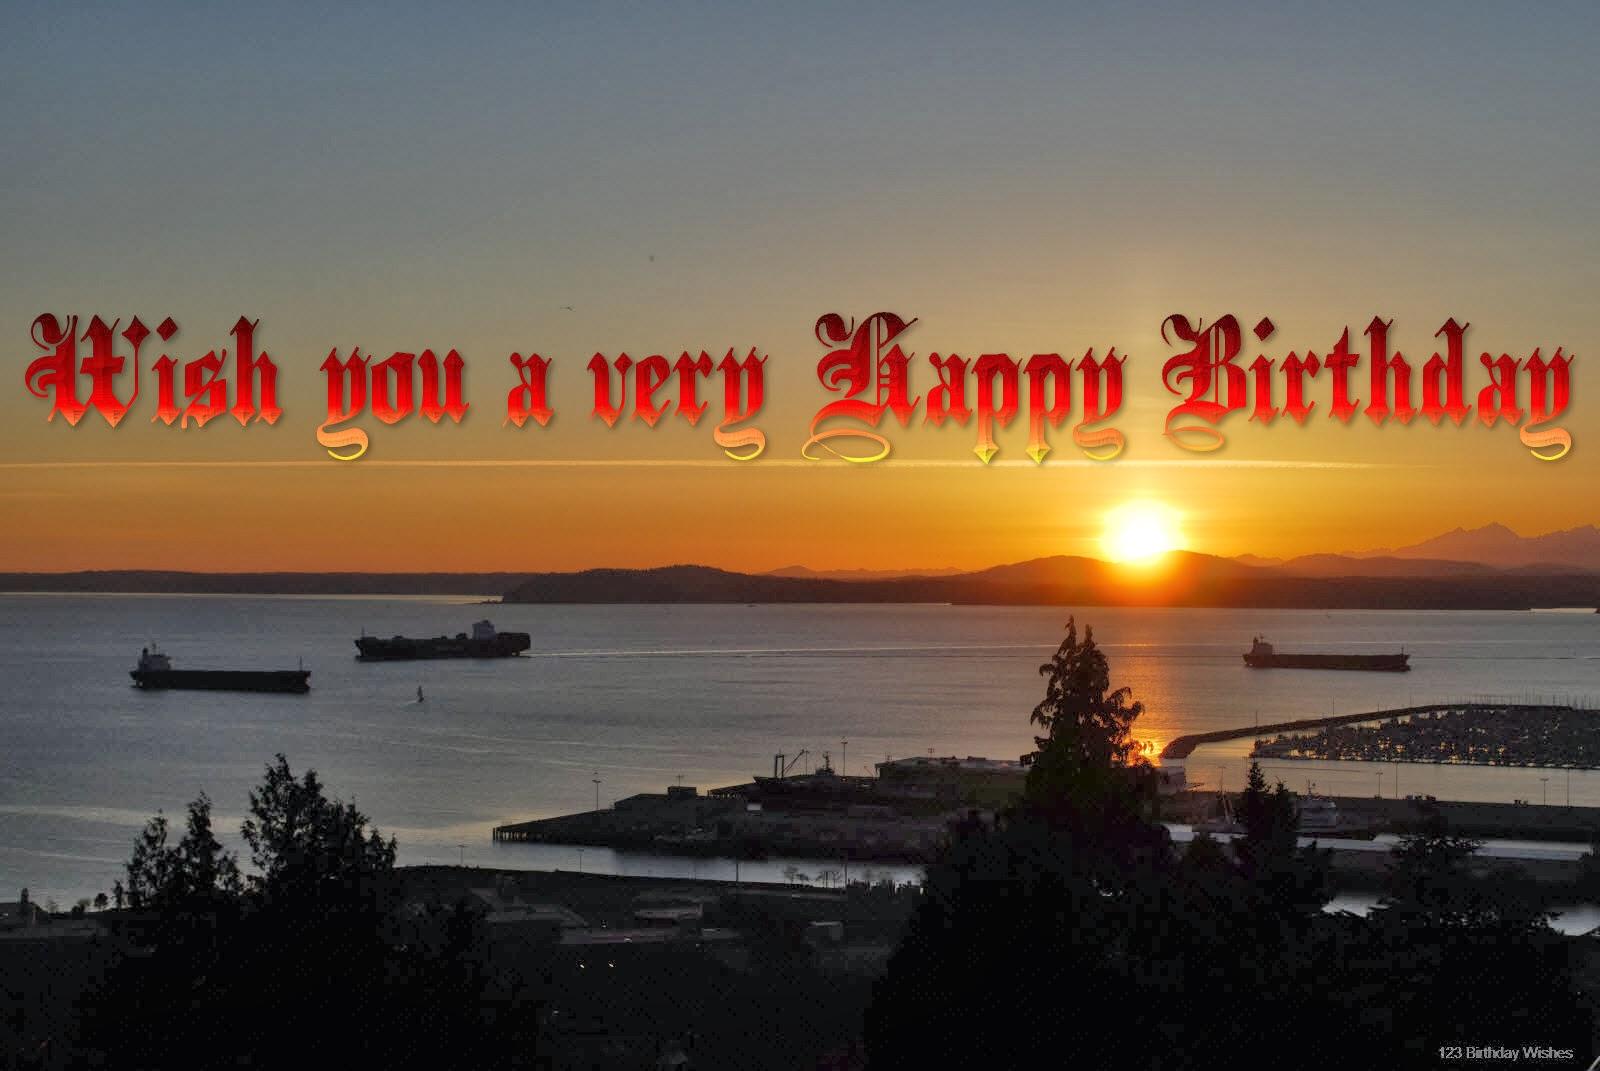 Happy Birthday Wish To Friend 3 123 Birthday Wishes